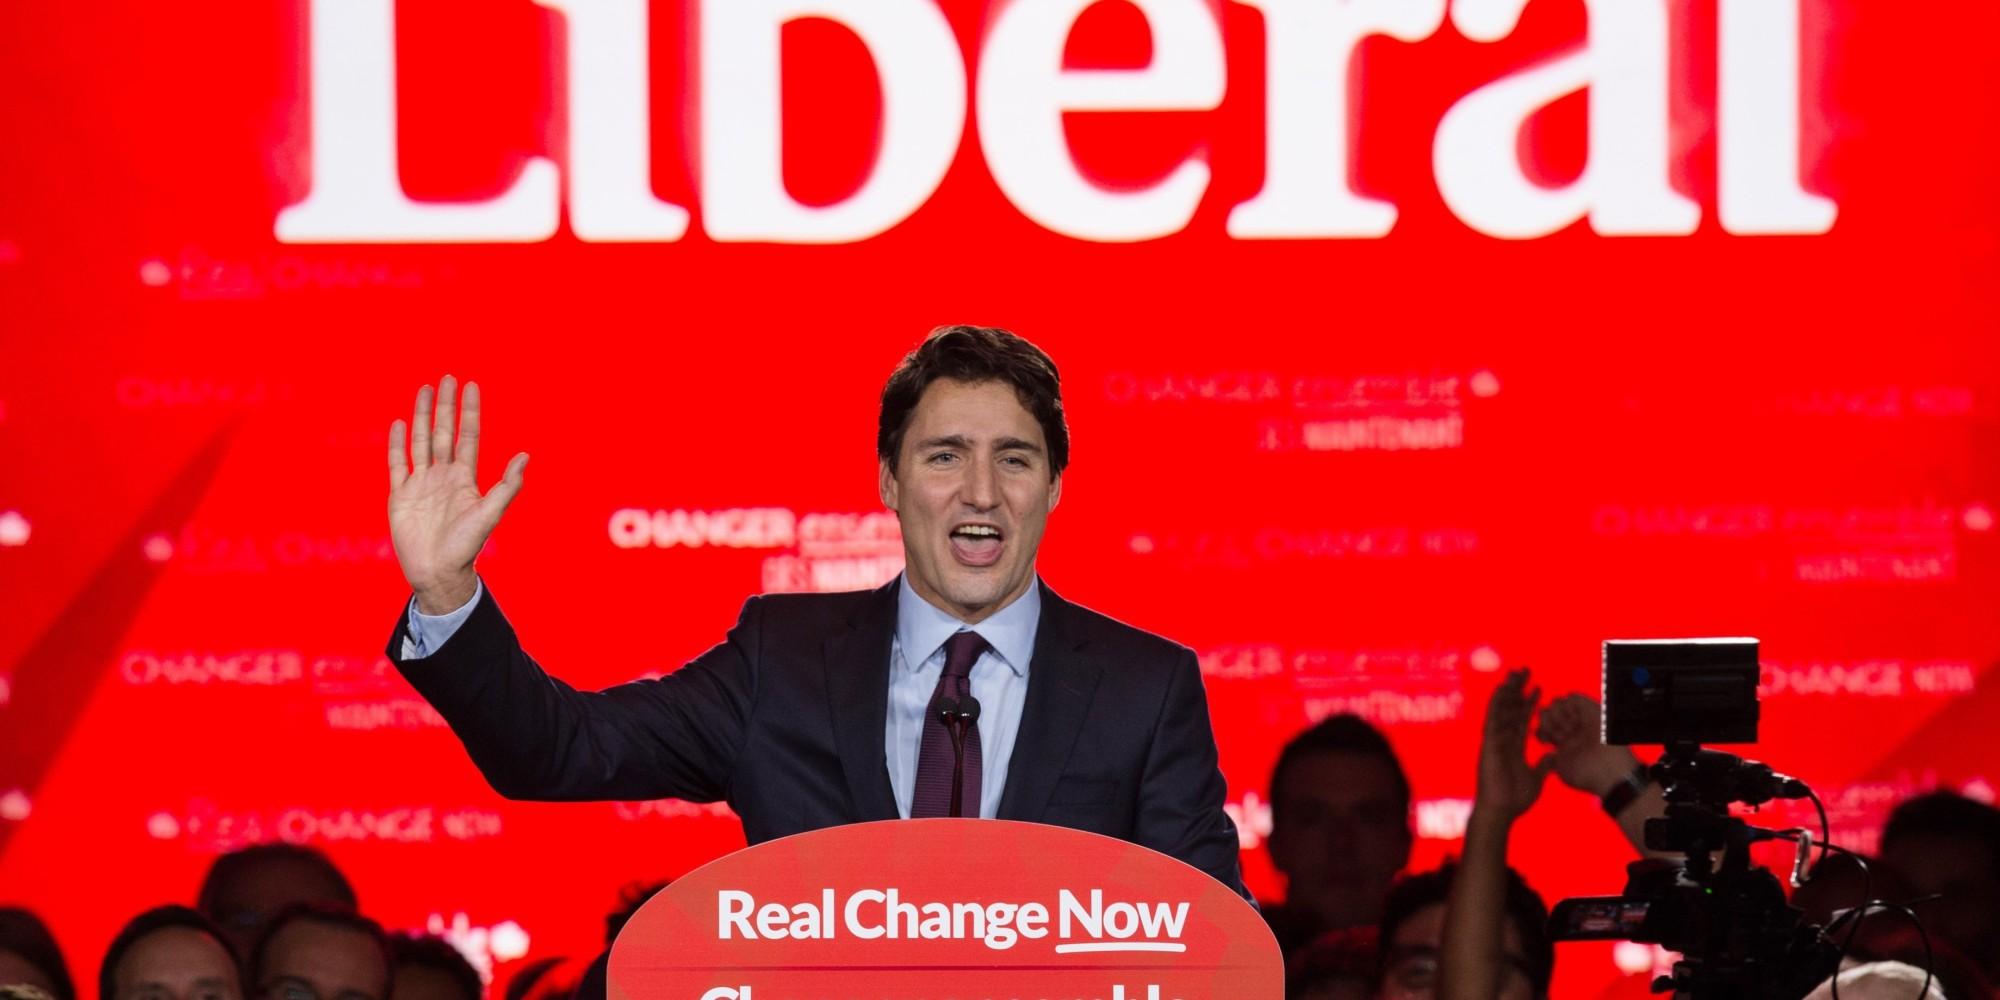 Trudeau speaks in Montreal